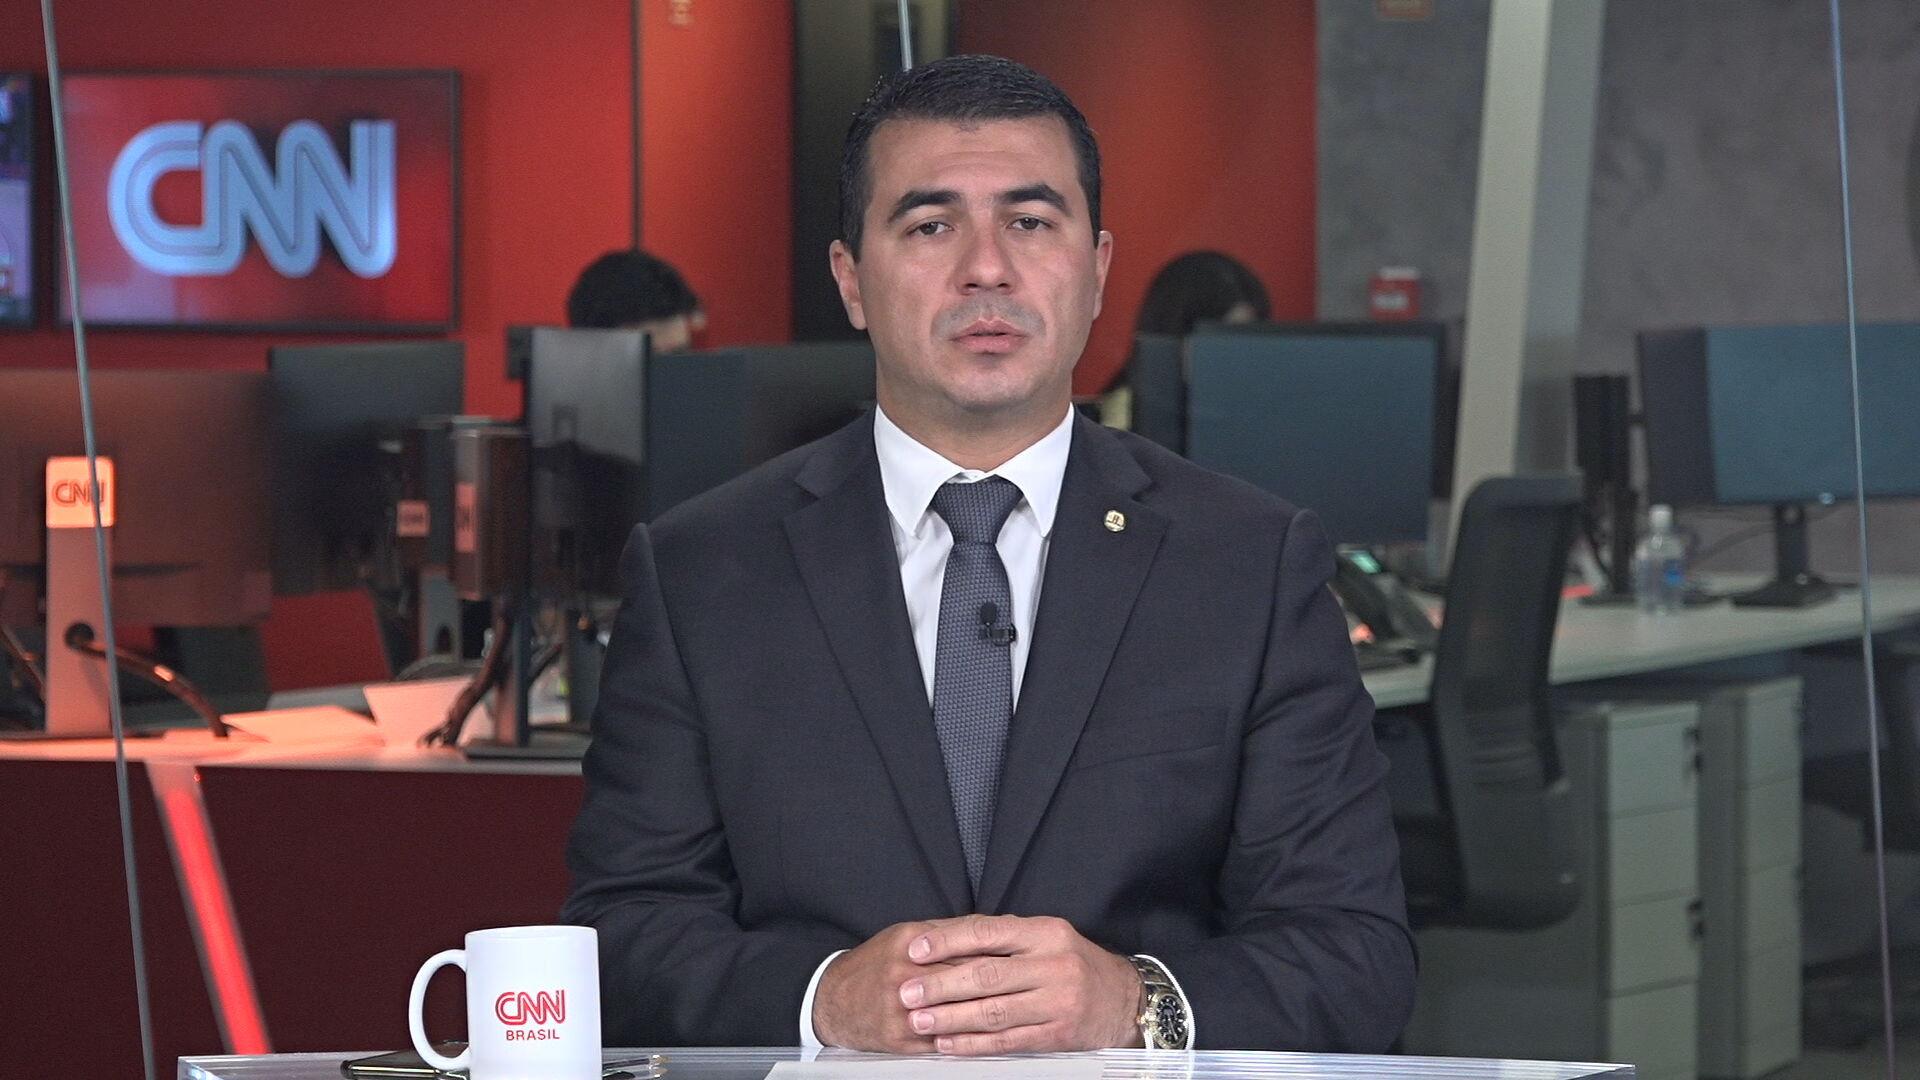 Deputado federal Luis Miranda (DEM-DF) fala à CNN sobre convite à CPI